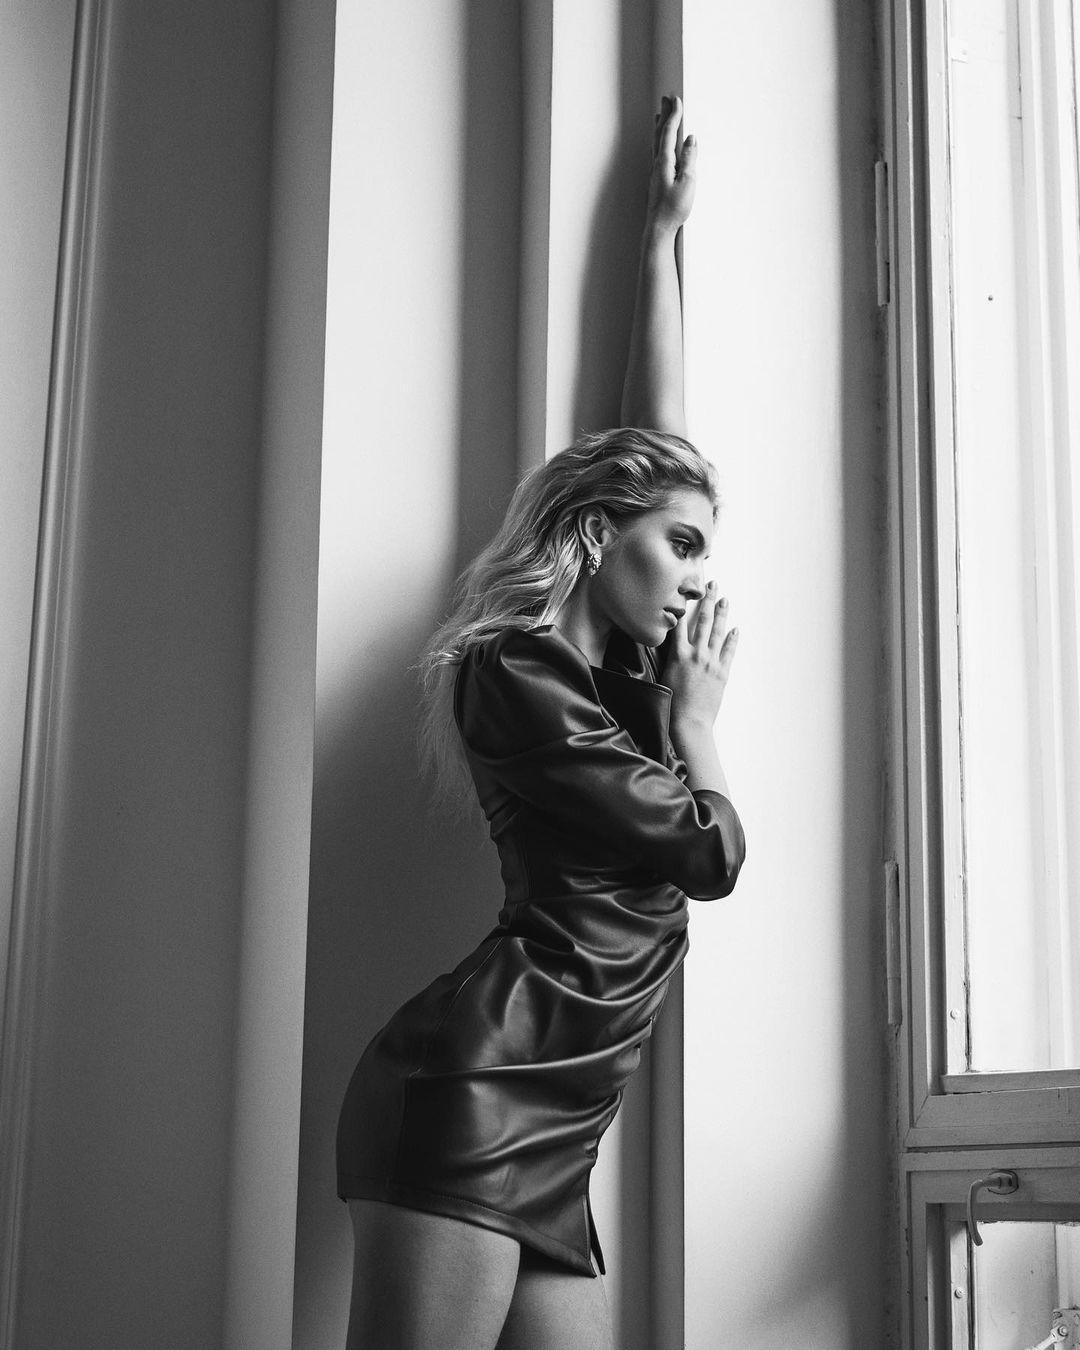 Natalia by Natali Brikman